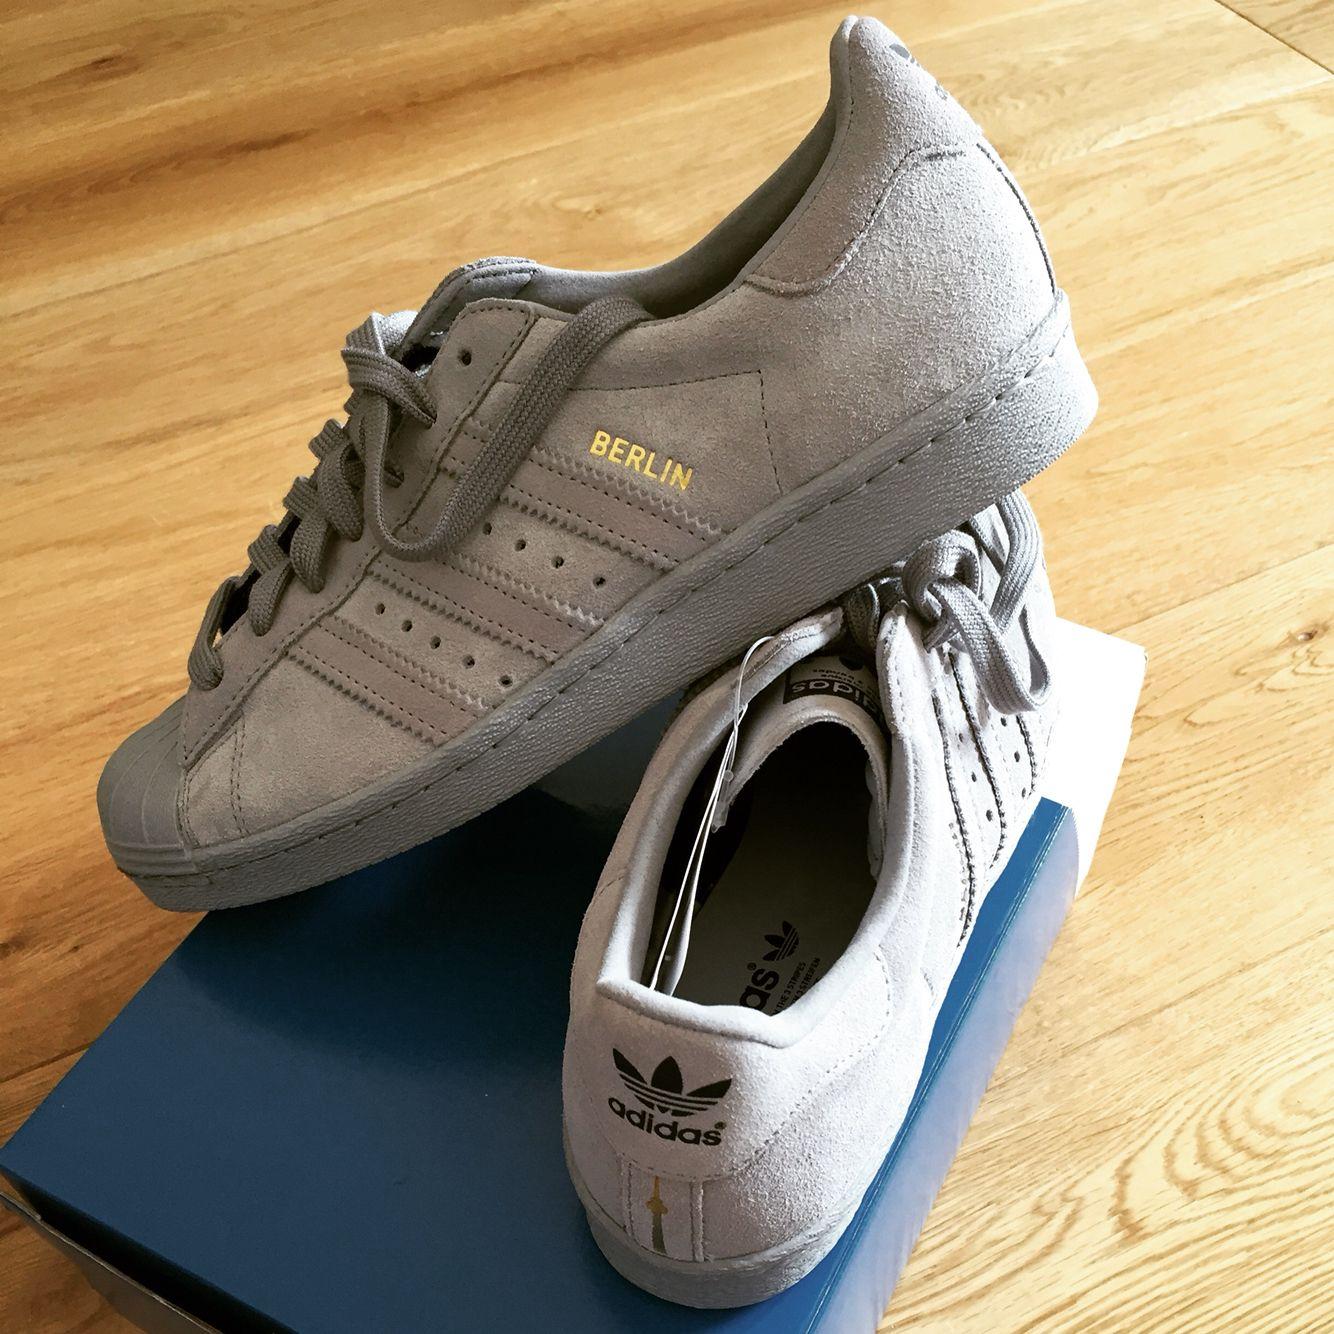 Adidas superstar city pack berlino scarpe pinterest adidas